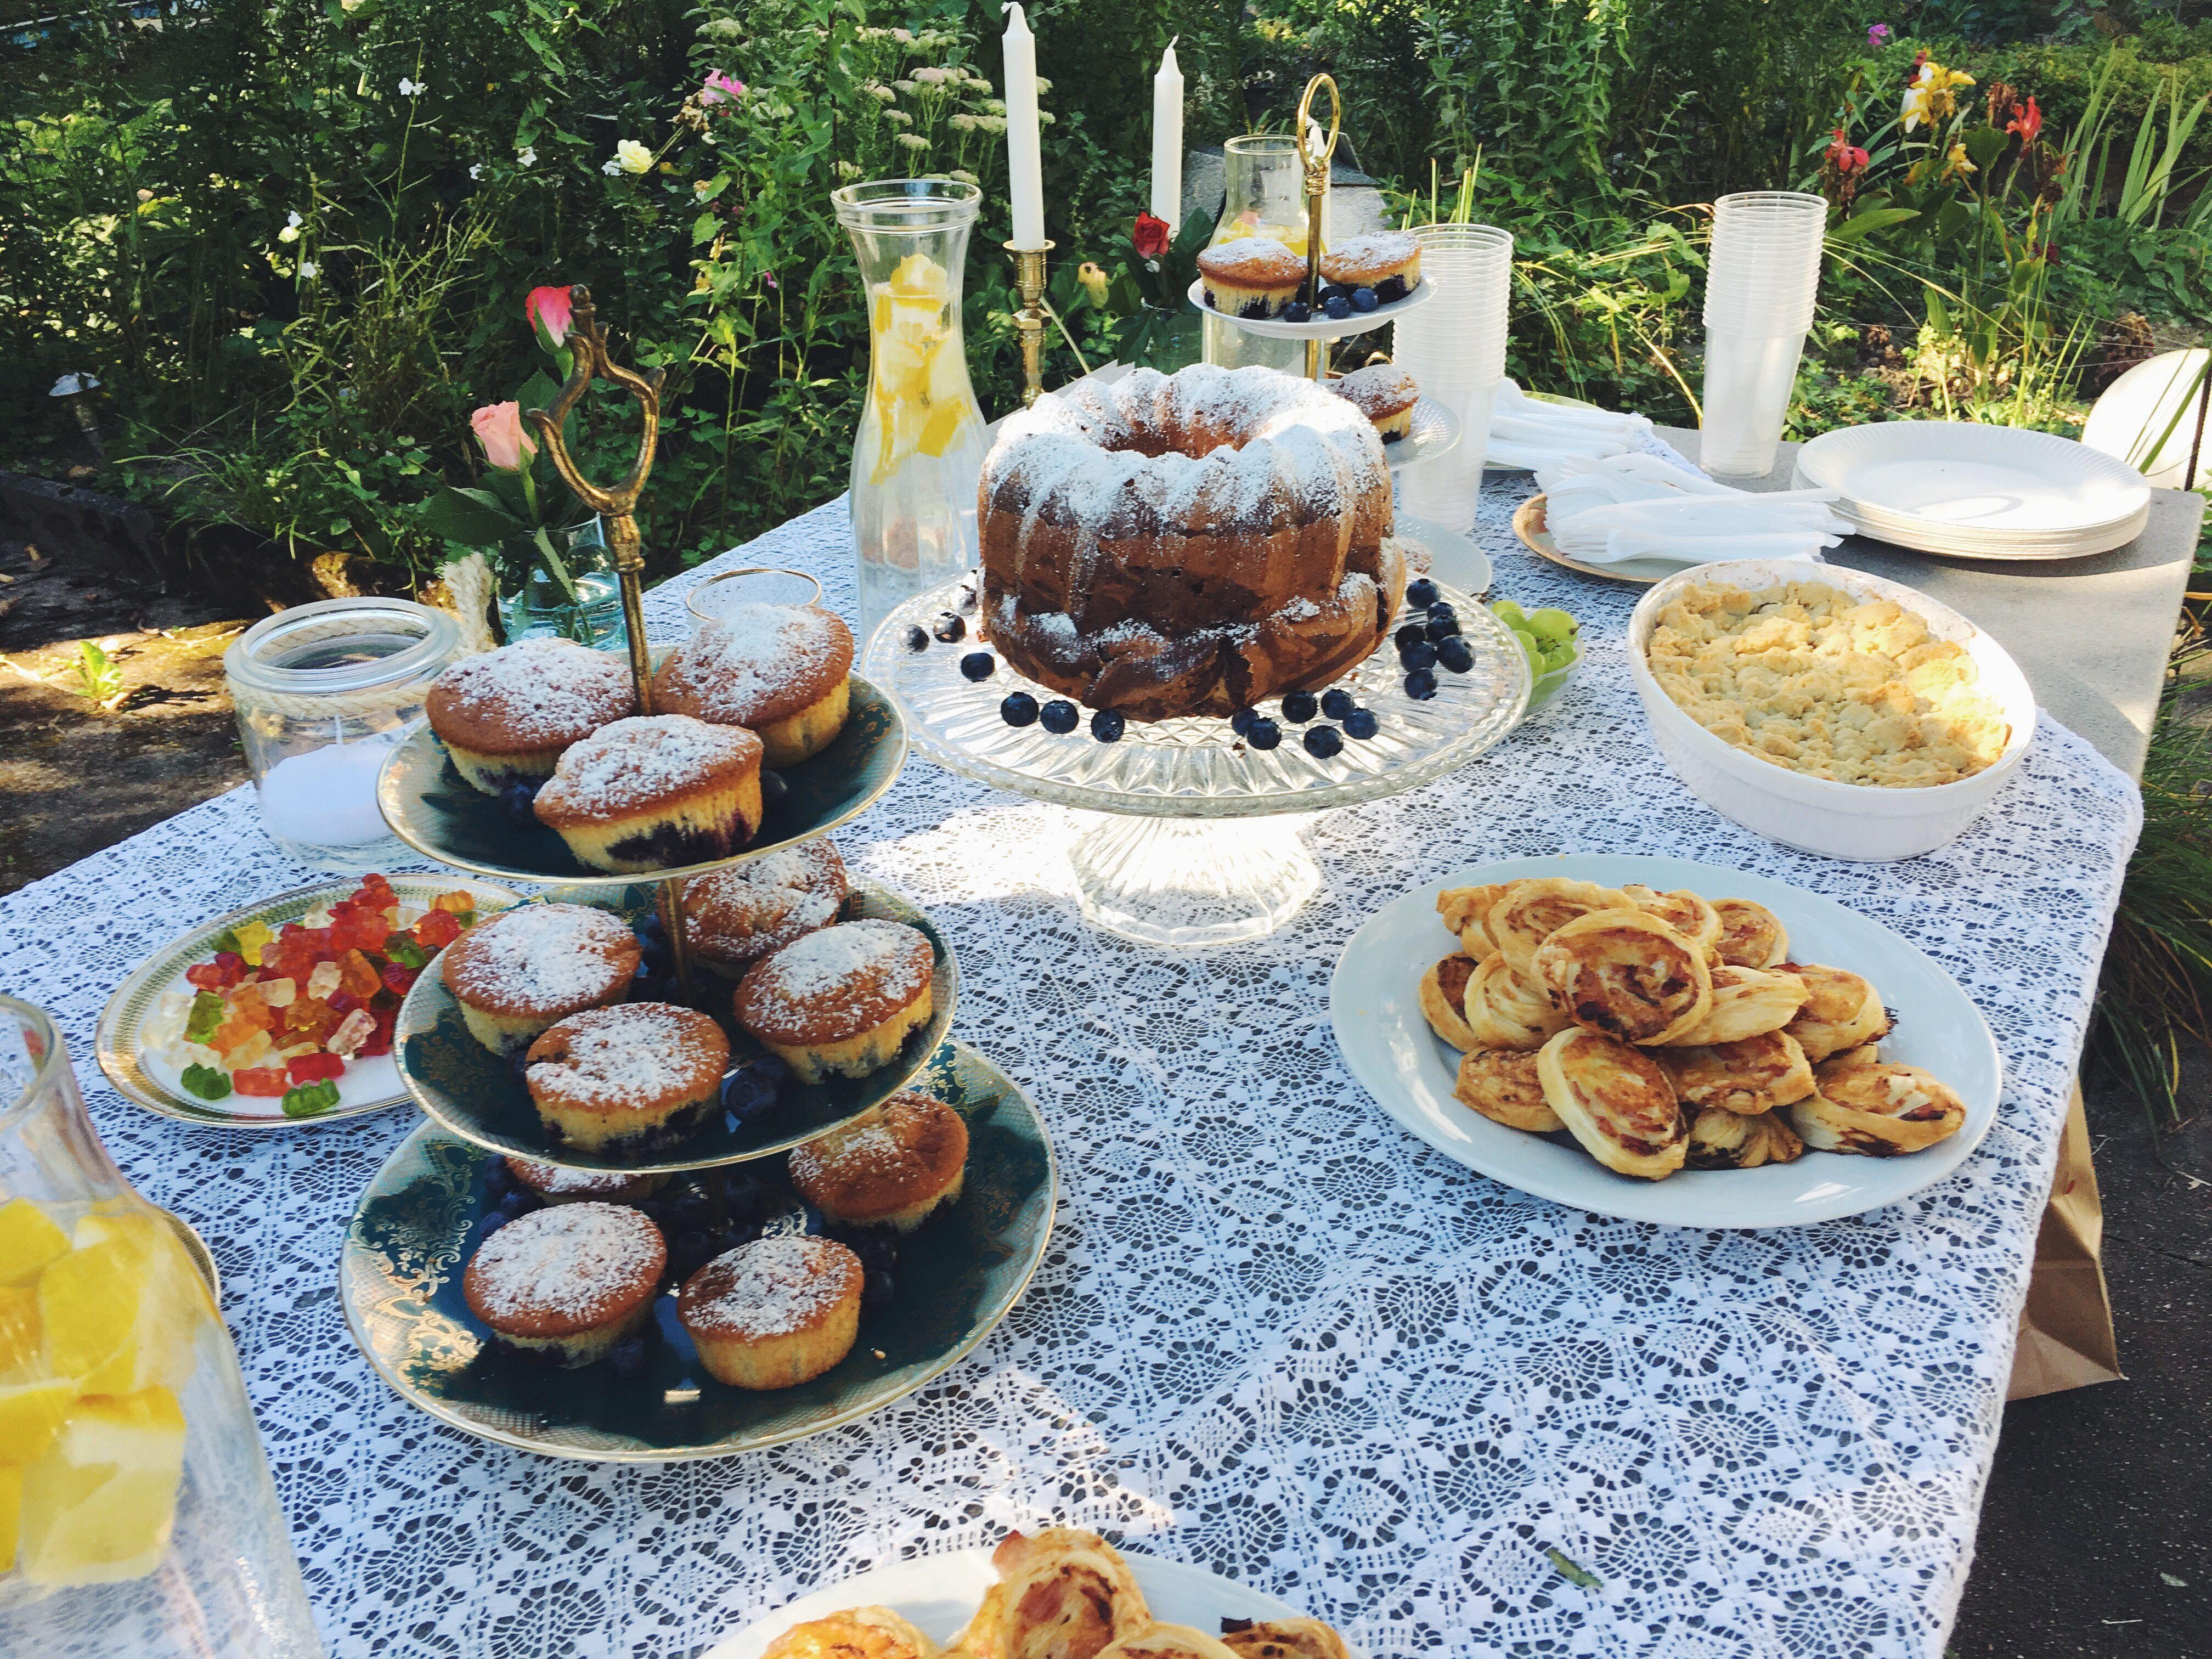 Birthday picnic ☀️ #deko #food #summer #outside